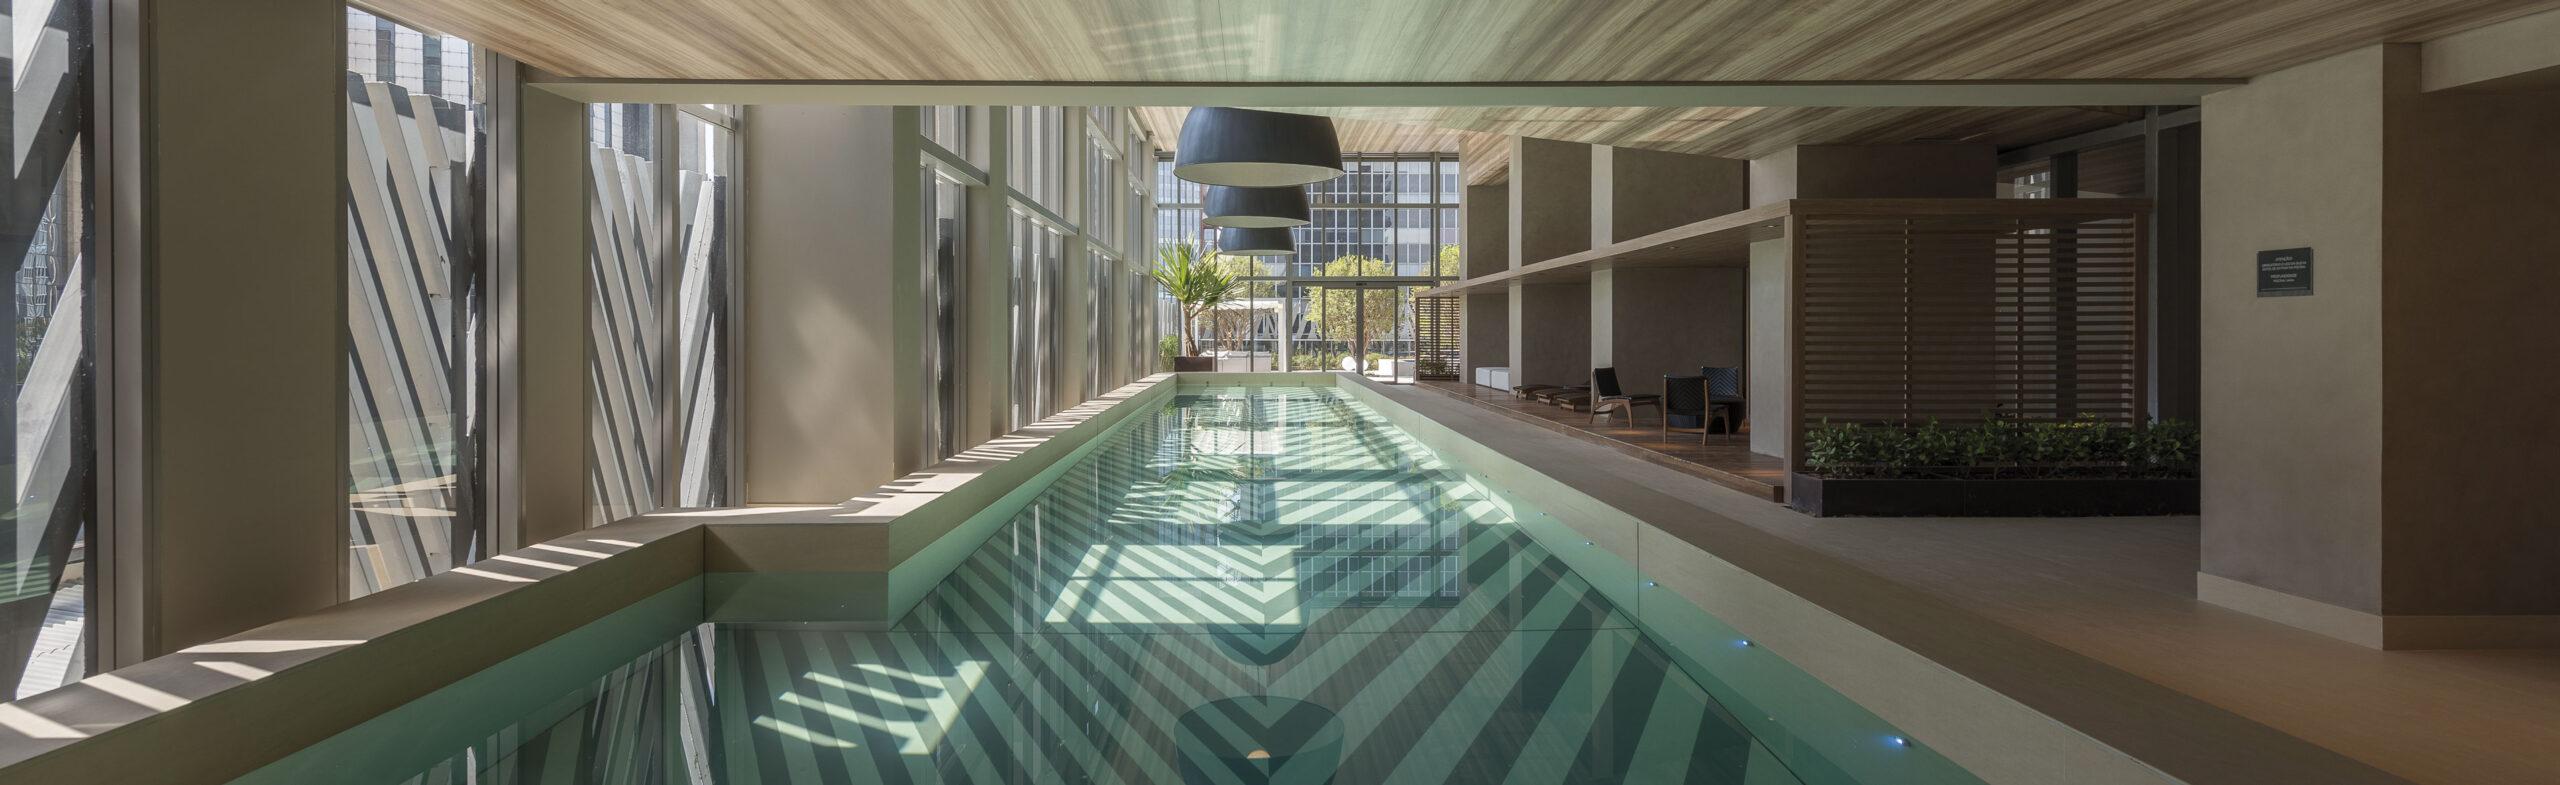 piscina micunco rivestimenti scaled